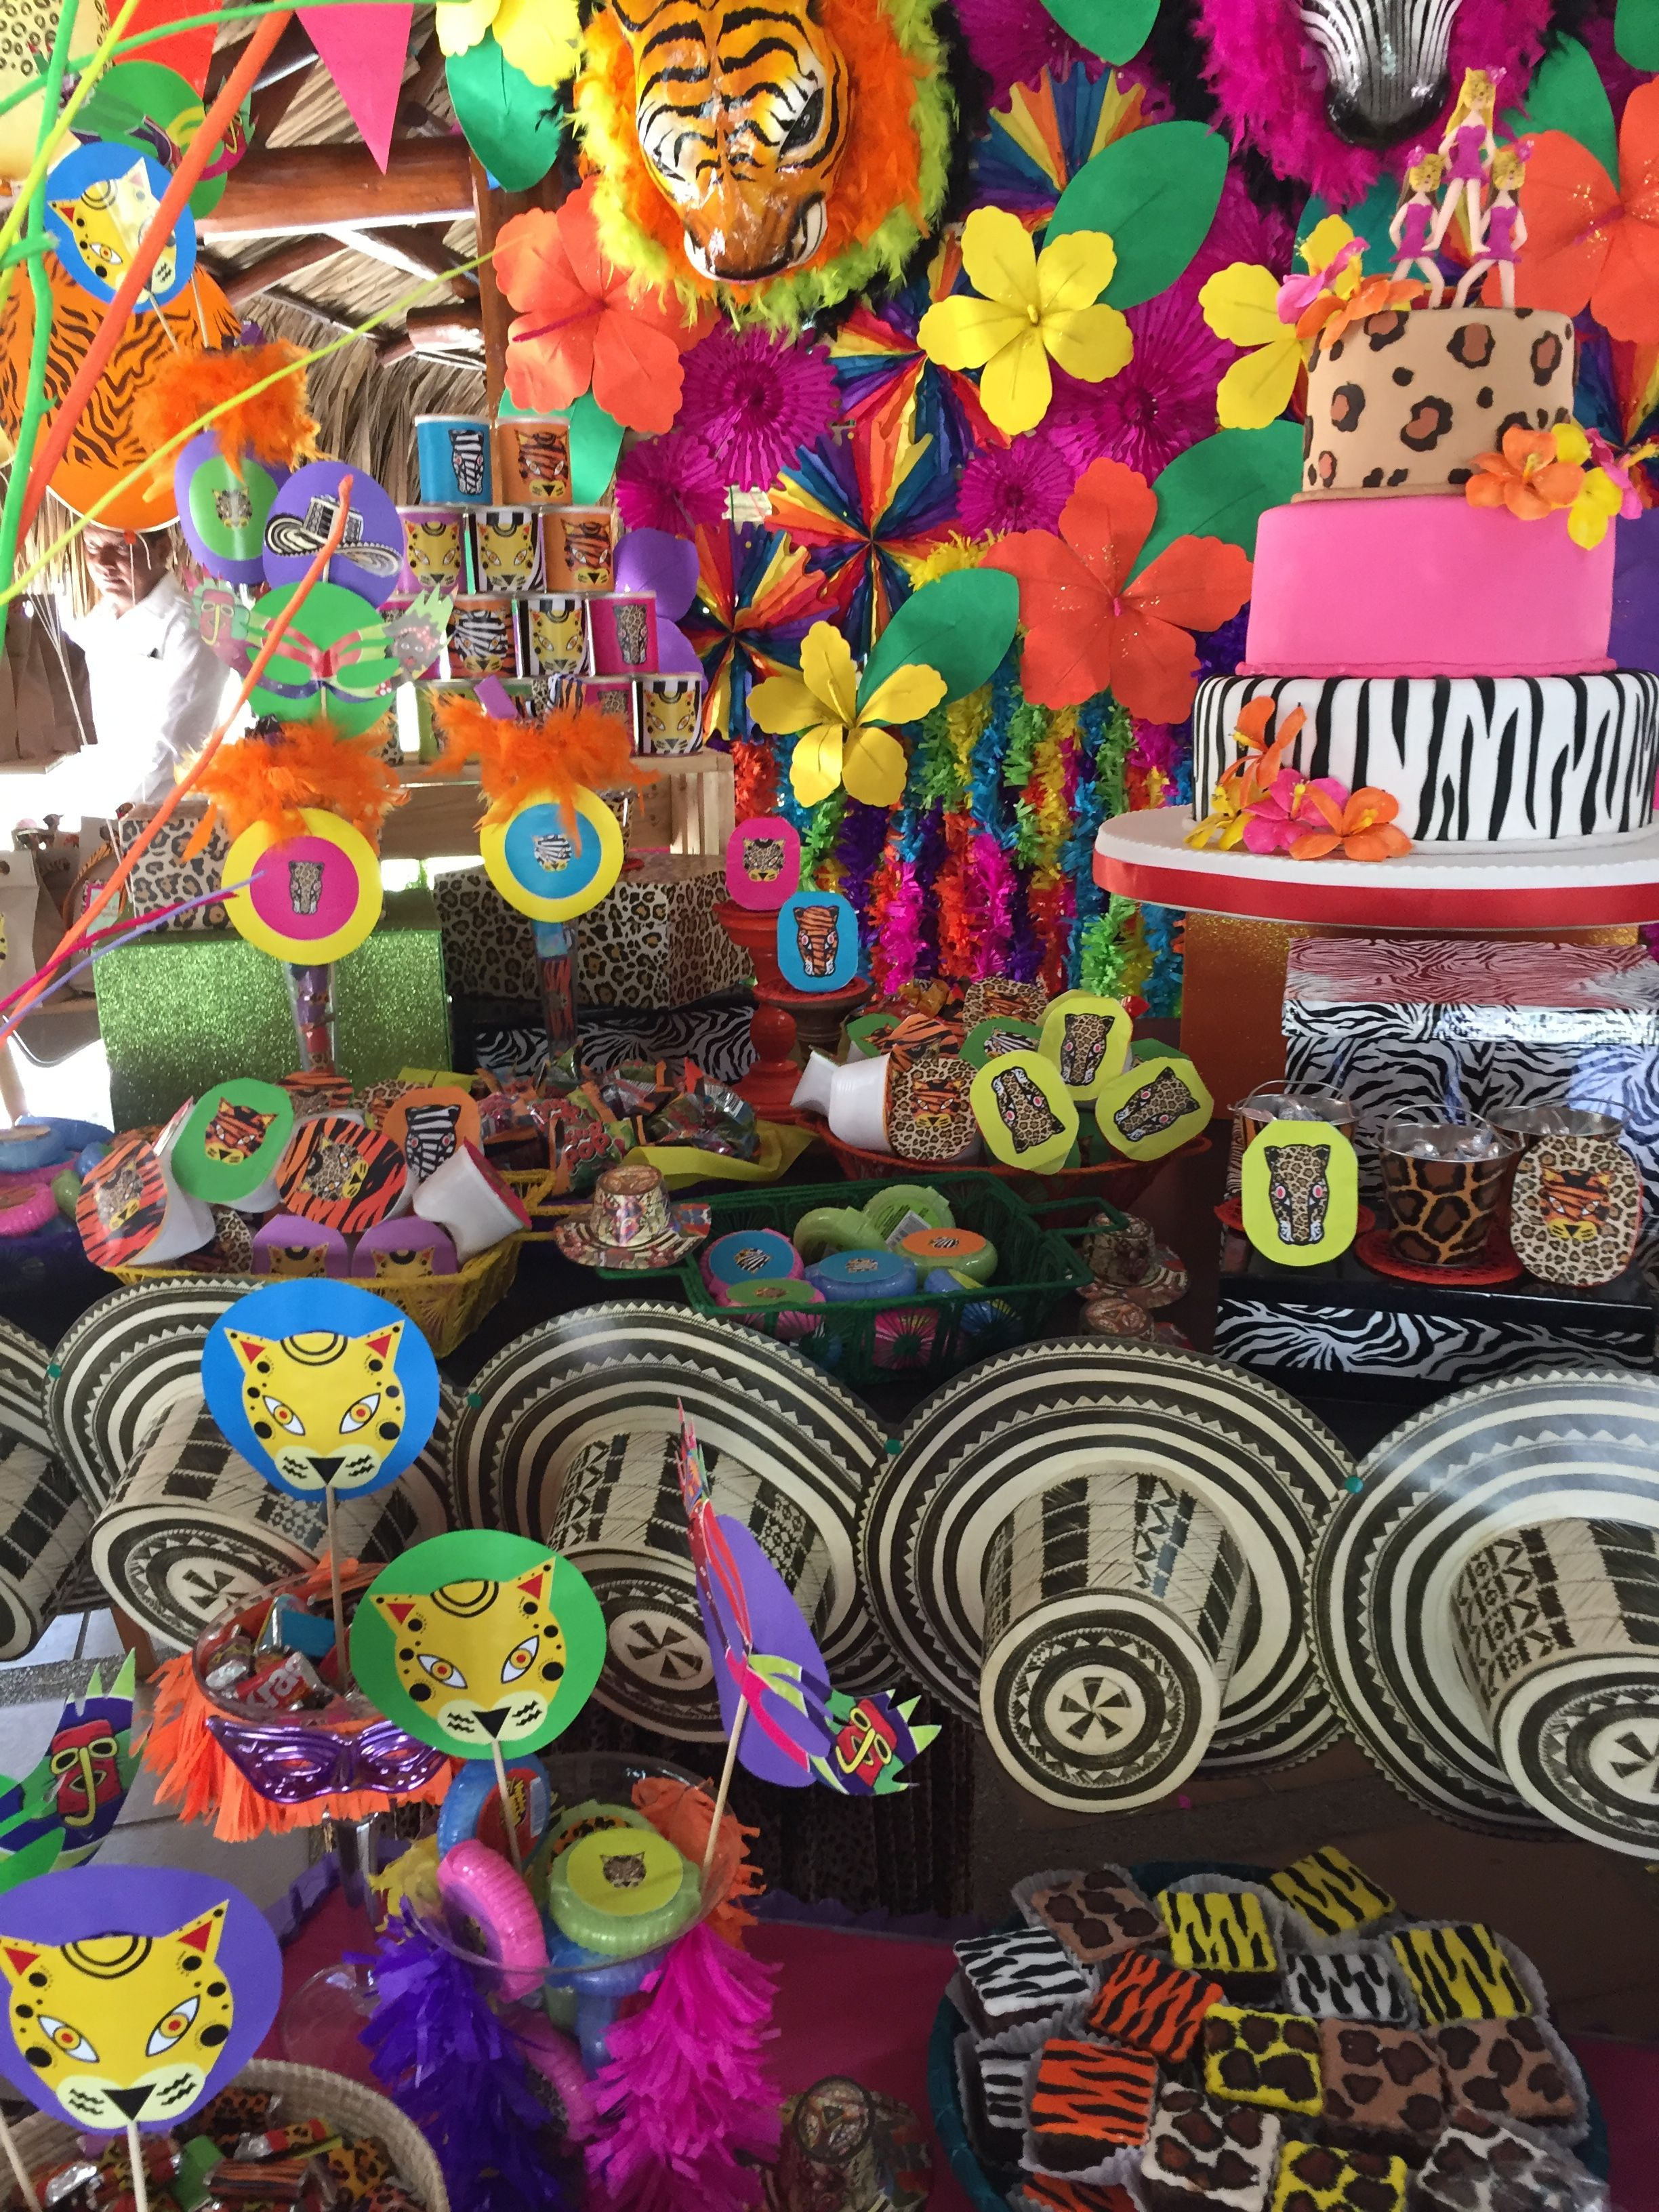 Fiesta Carnaval De Barranquilla Decoraci U00f3n Carnaval De